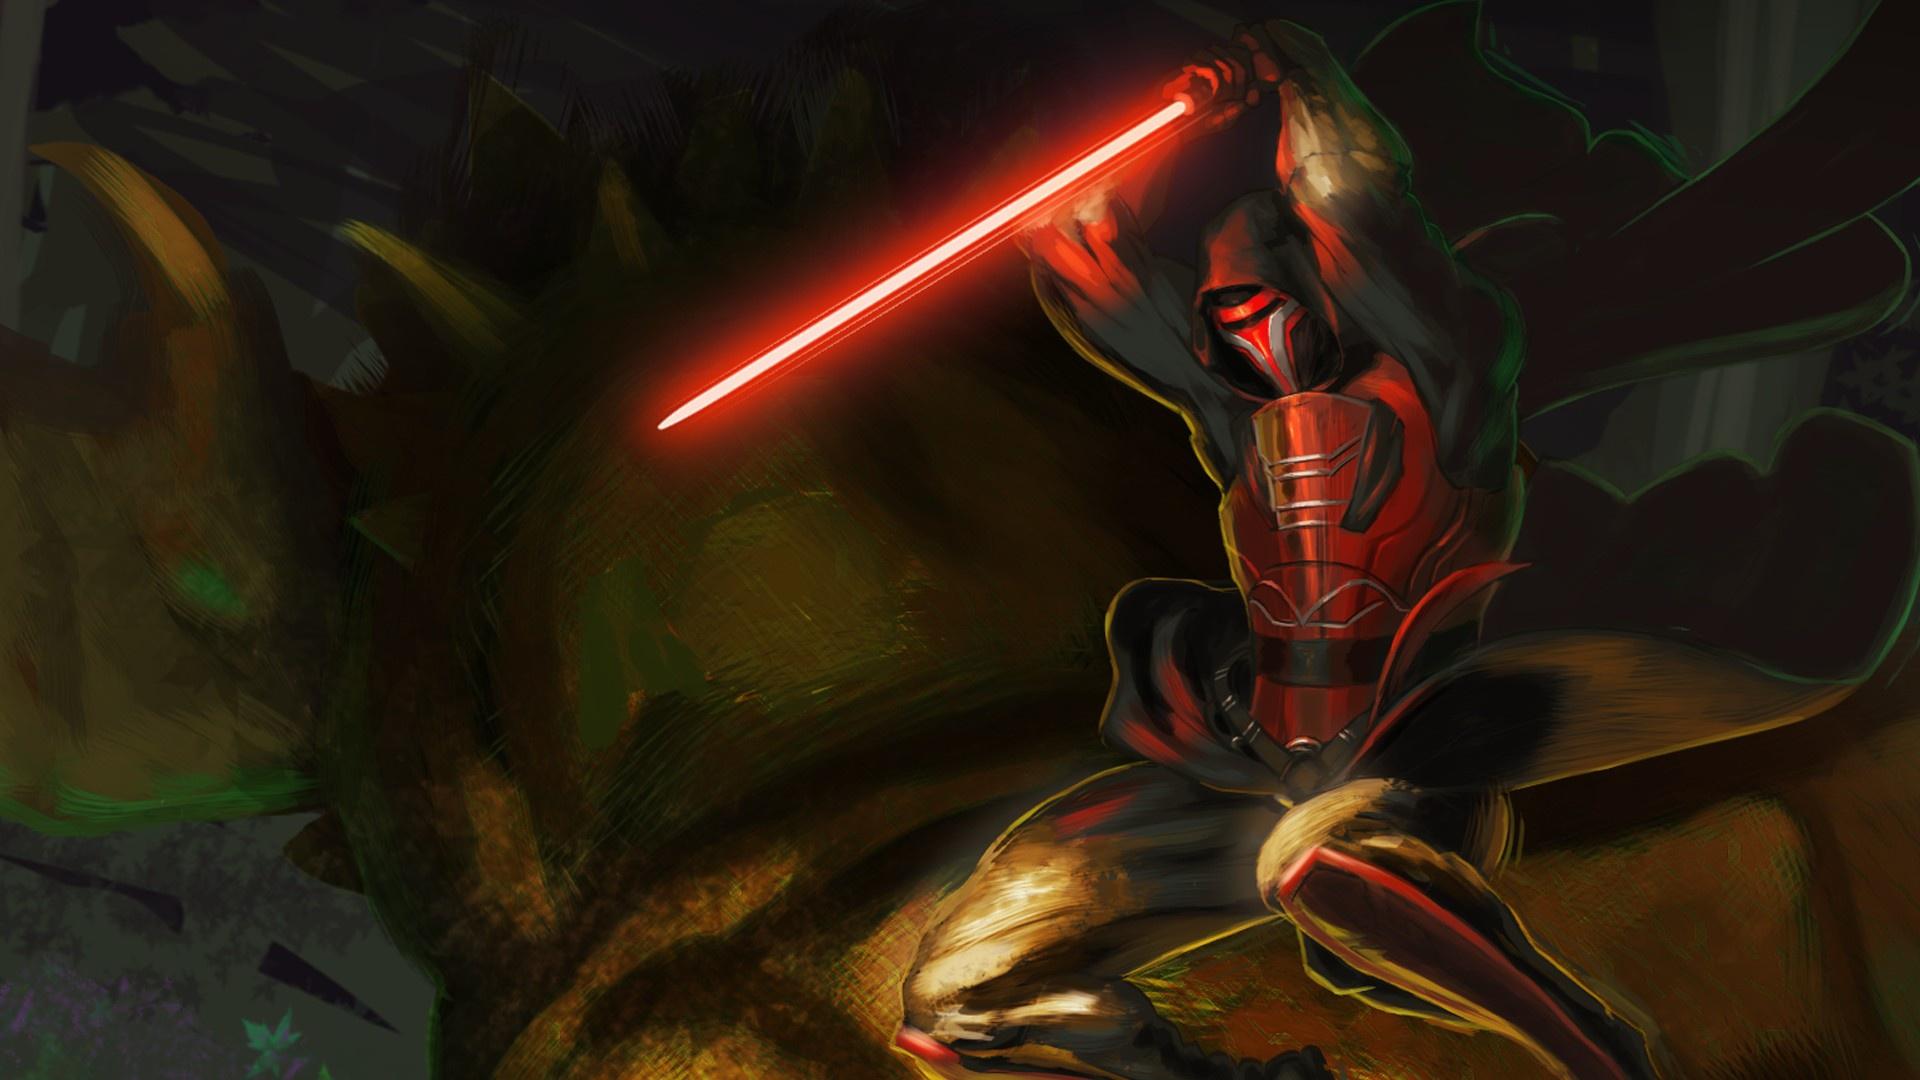 Wallpaper Star Wars Darth Revan Star Wars Knights Of The Old Republic Lightsaber Sith 1920x1080 Felixal 1225115 Hd Wallpapers Wallhere